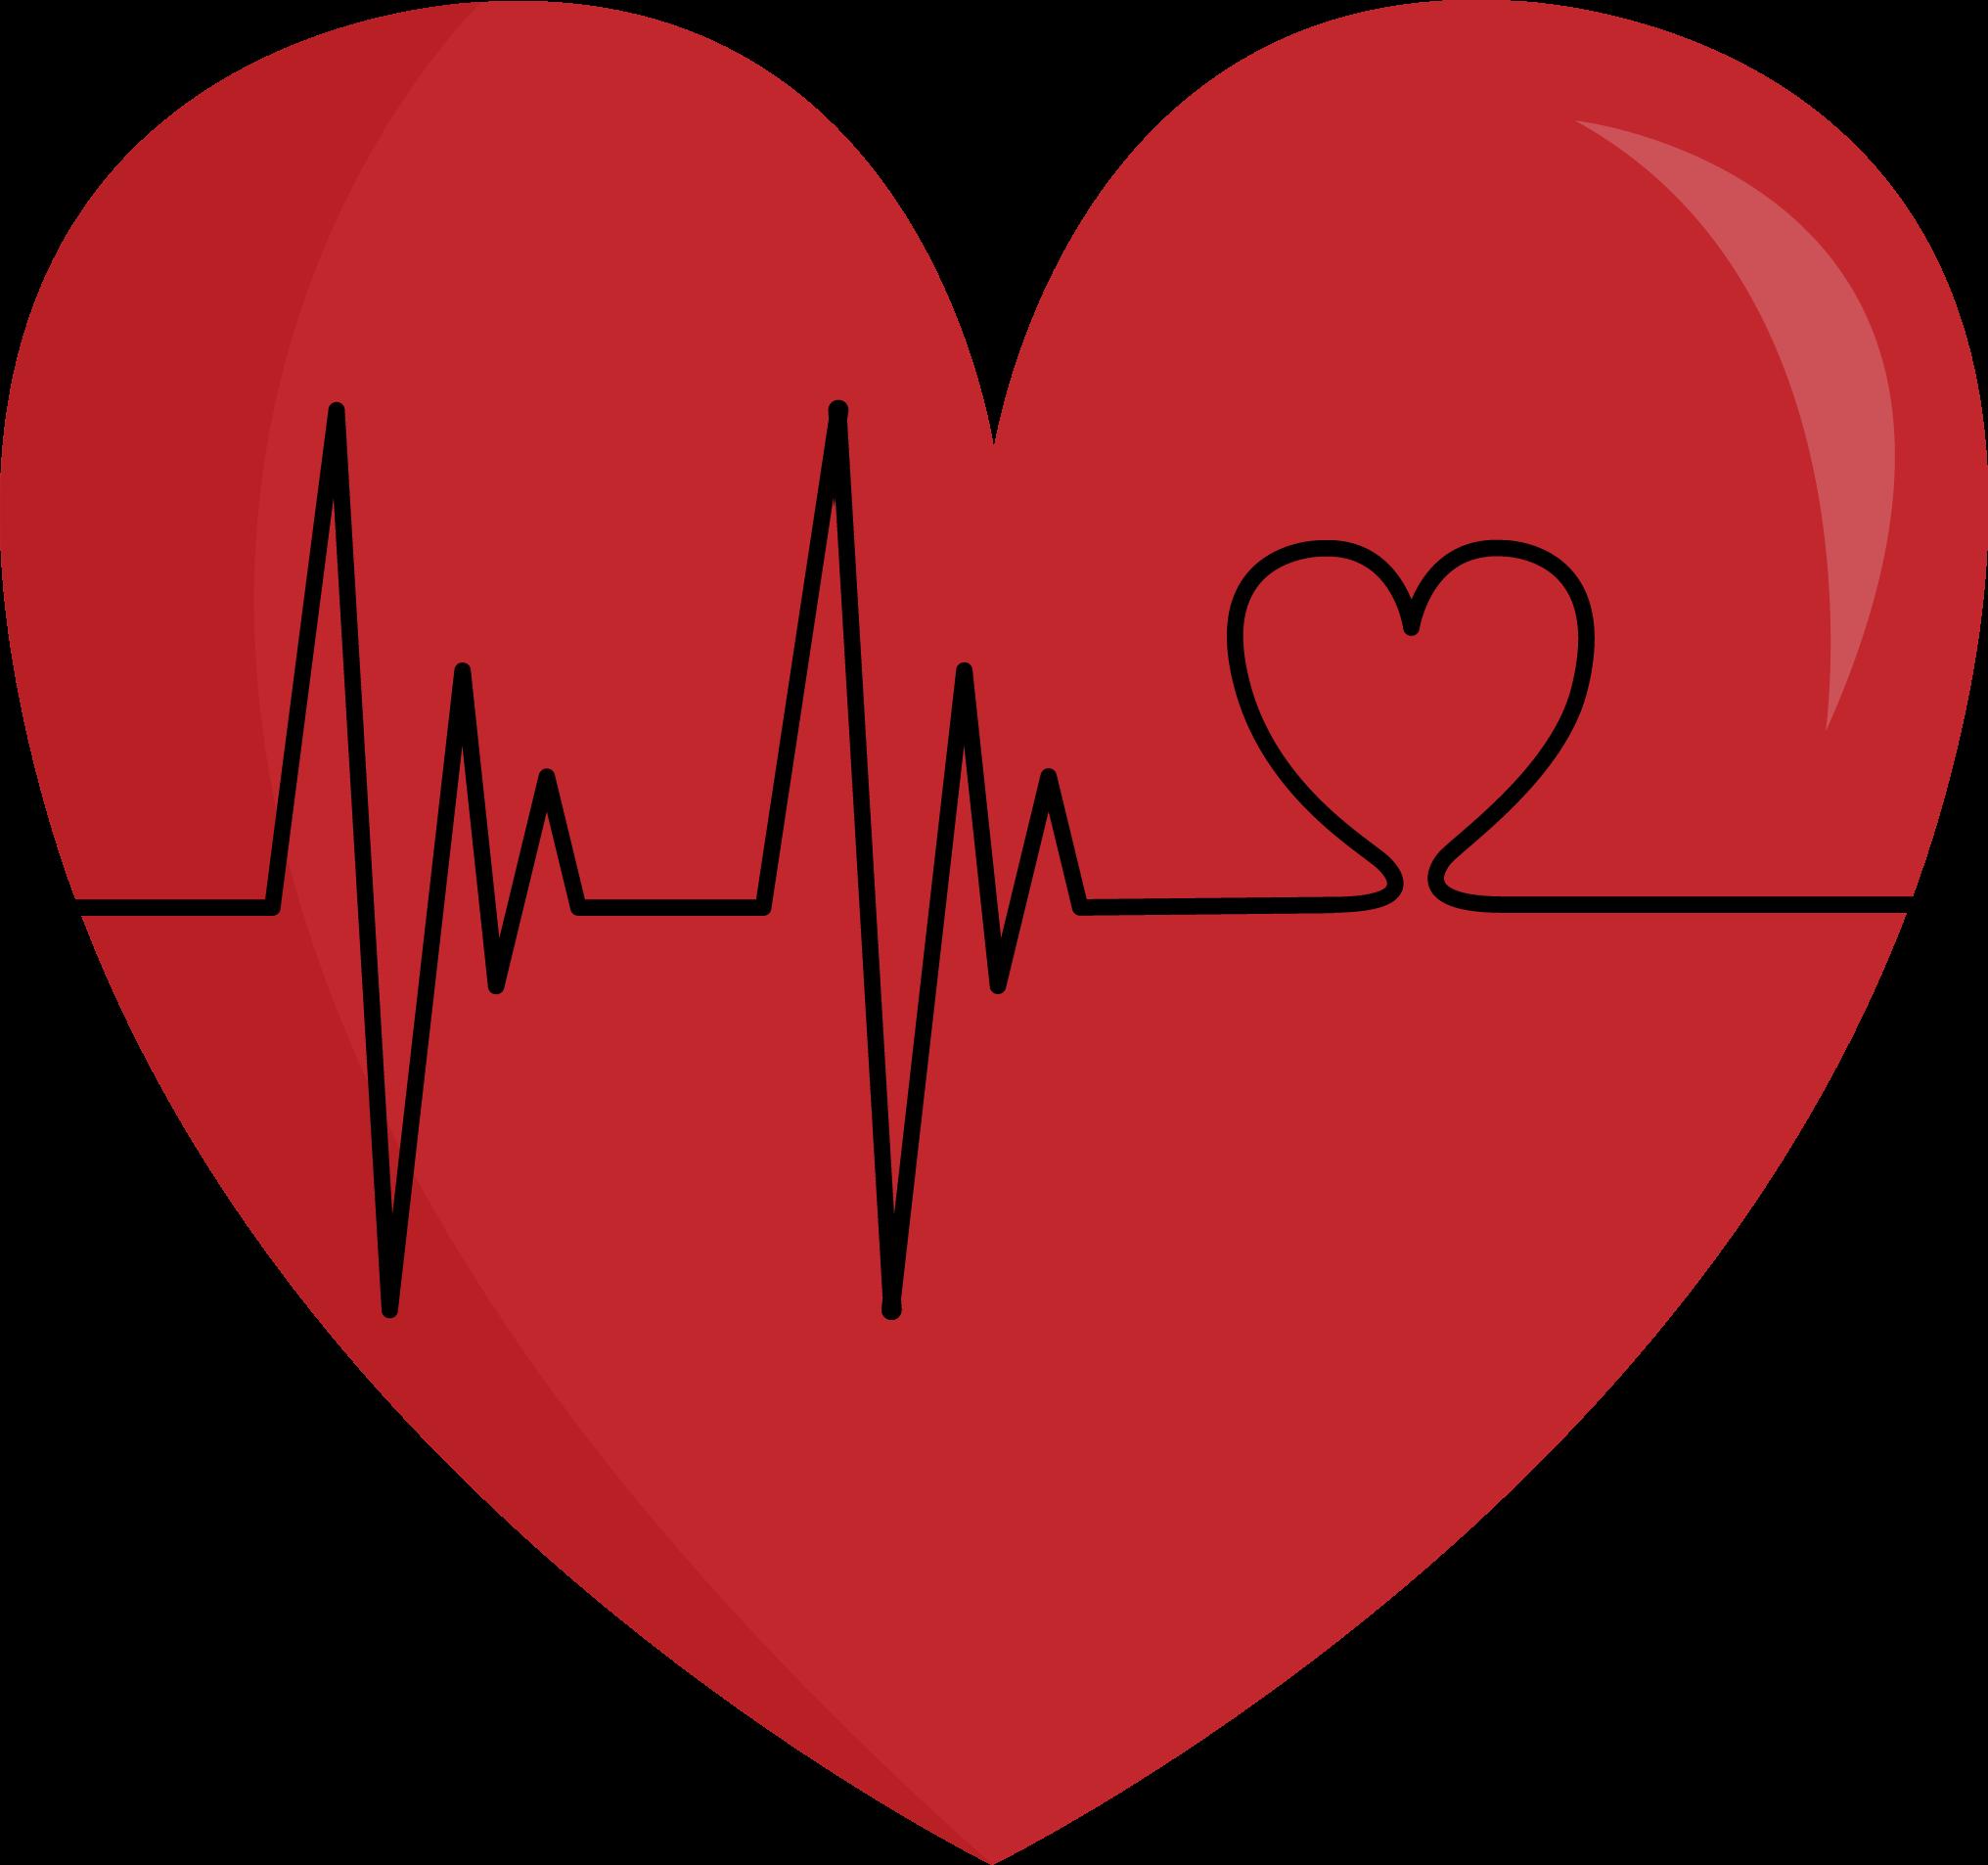 Heartbeat clipart bradycardia.  collection of heart